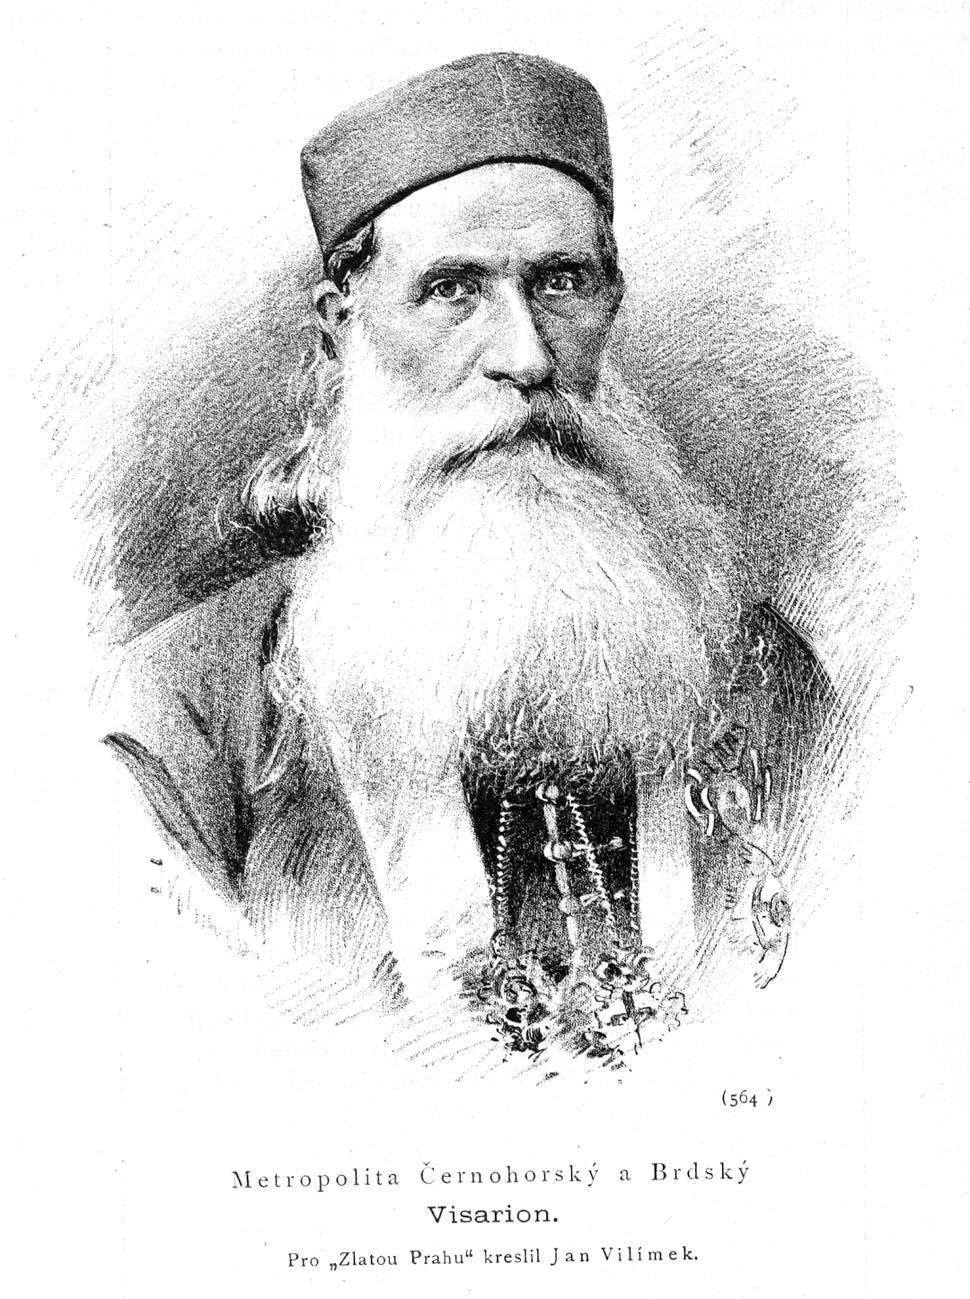 Visarion Ljubisa 1884 Vilimek